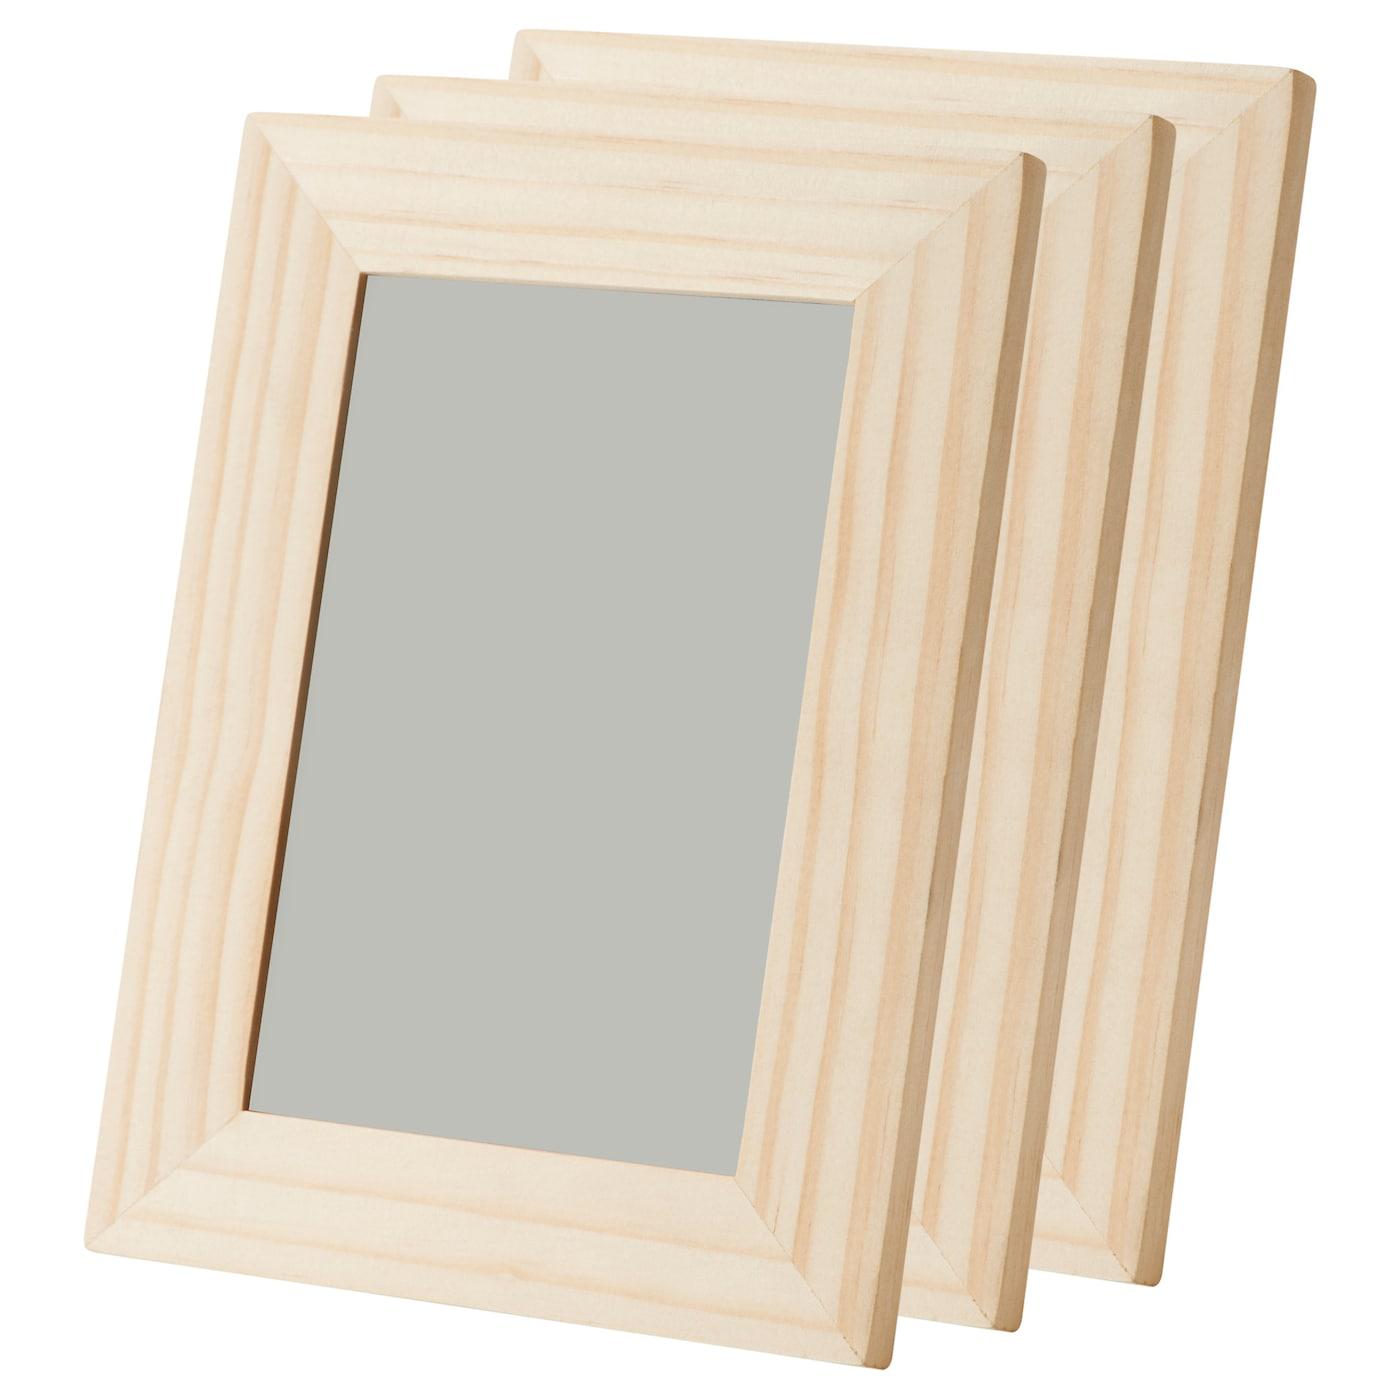 affordable ikea albrunna cadre protection en plastique pour une plus grande scurit with cadre. Black Bedroom Furniture Sets. Home Design Ideas